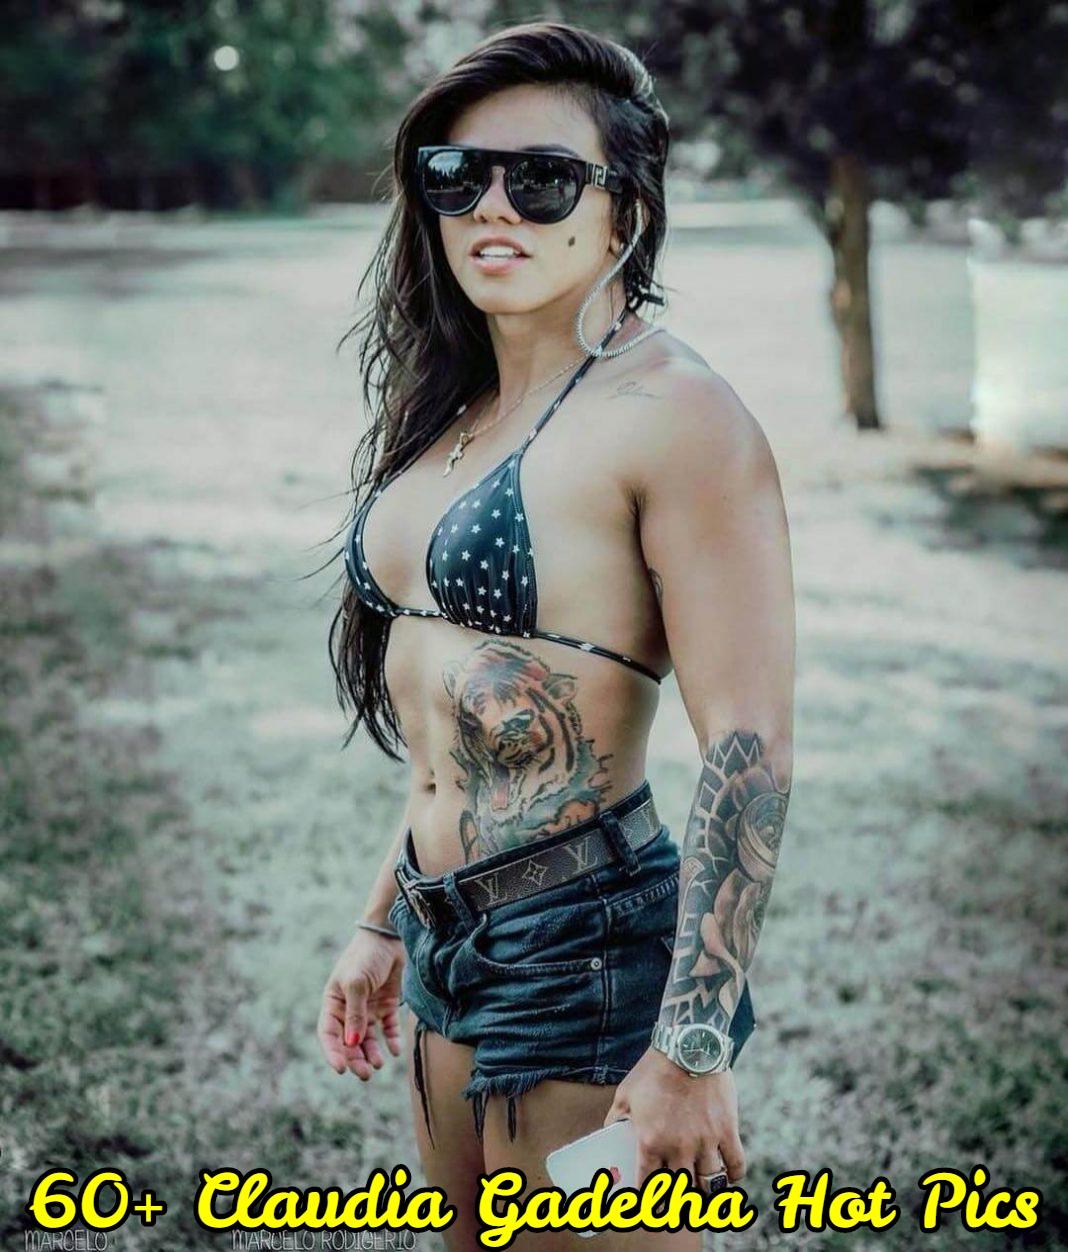 Claudia Gadelha topless pics